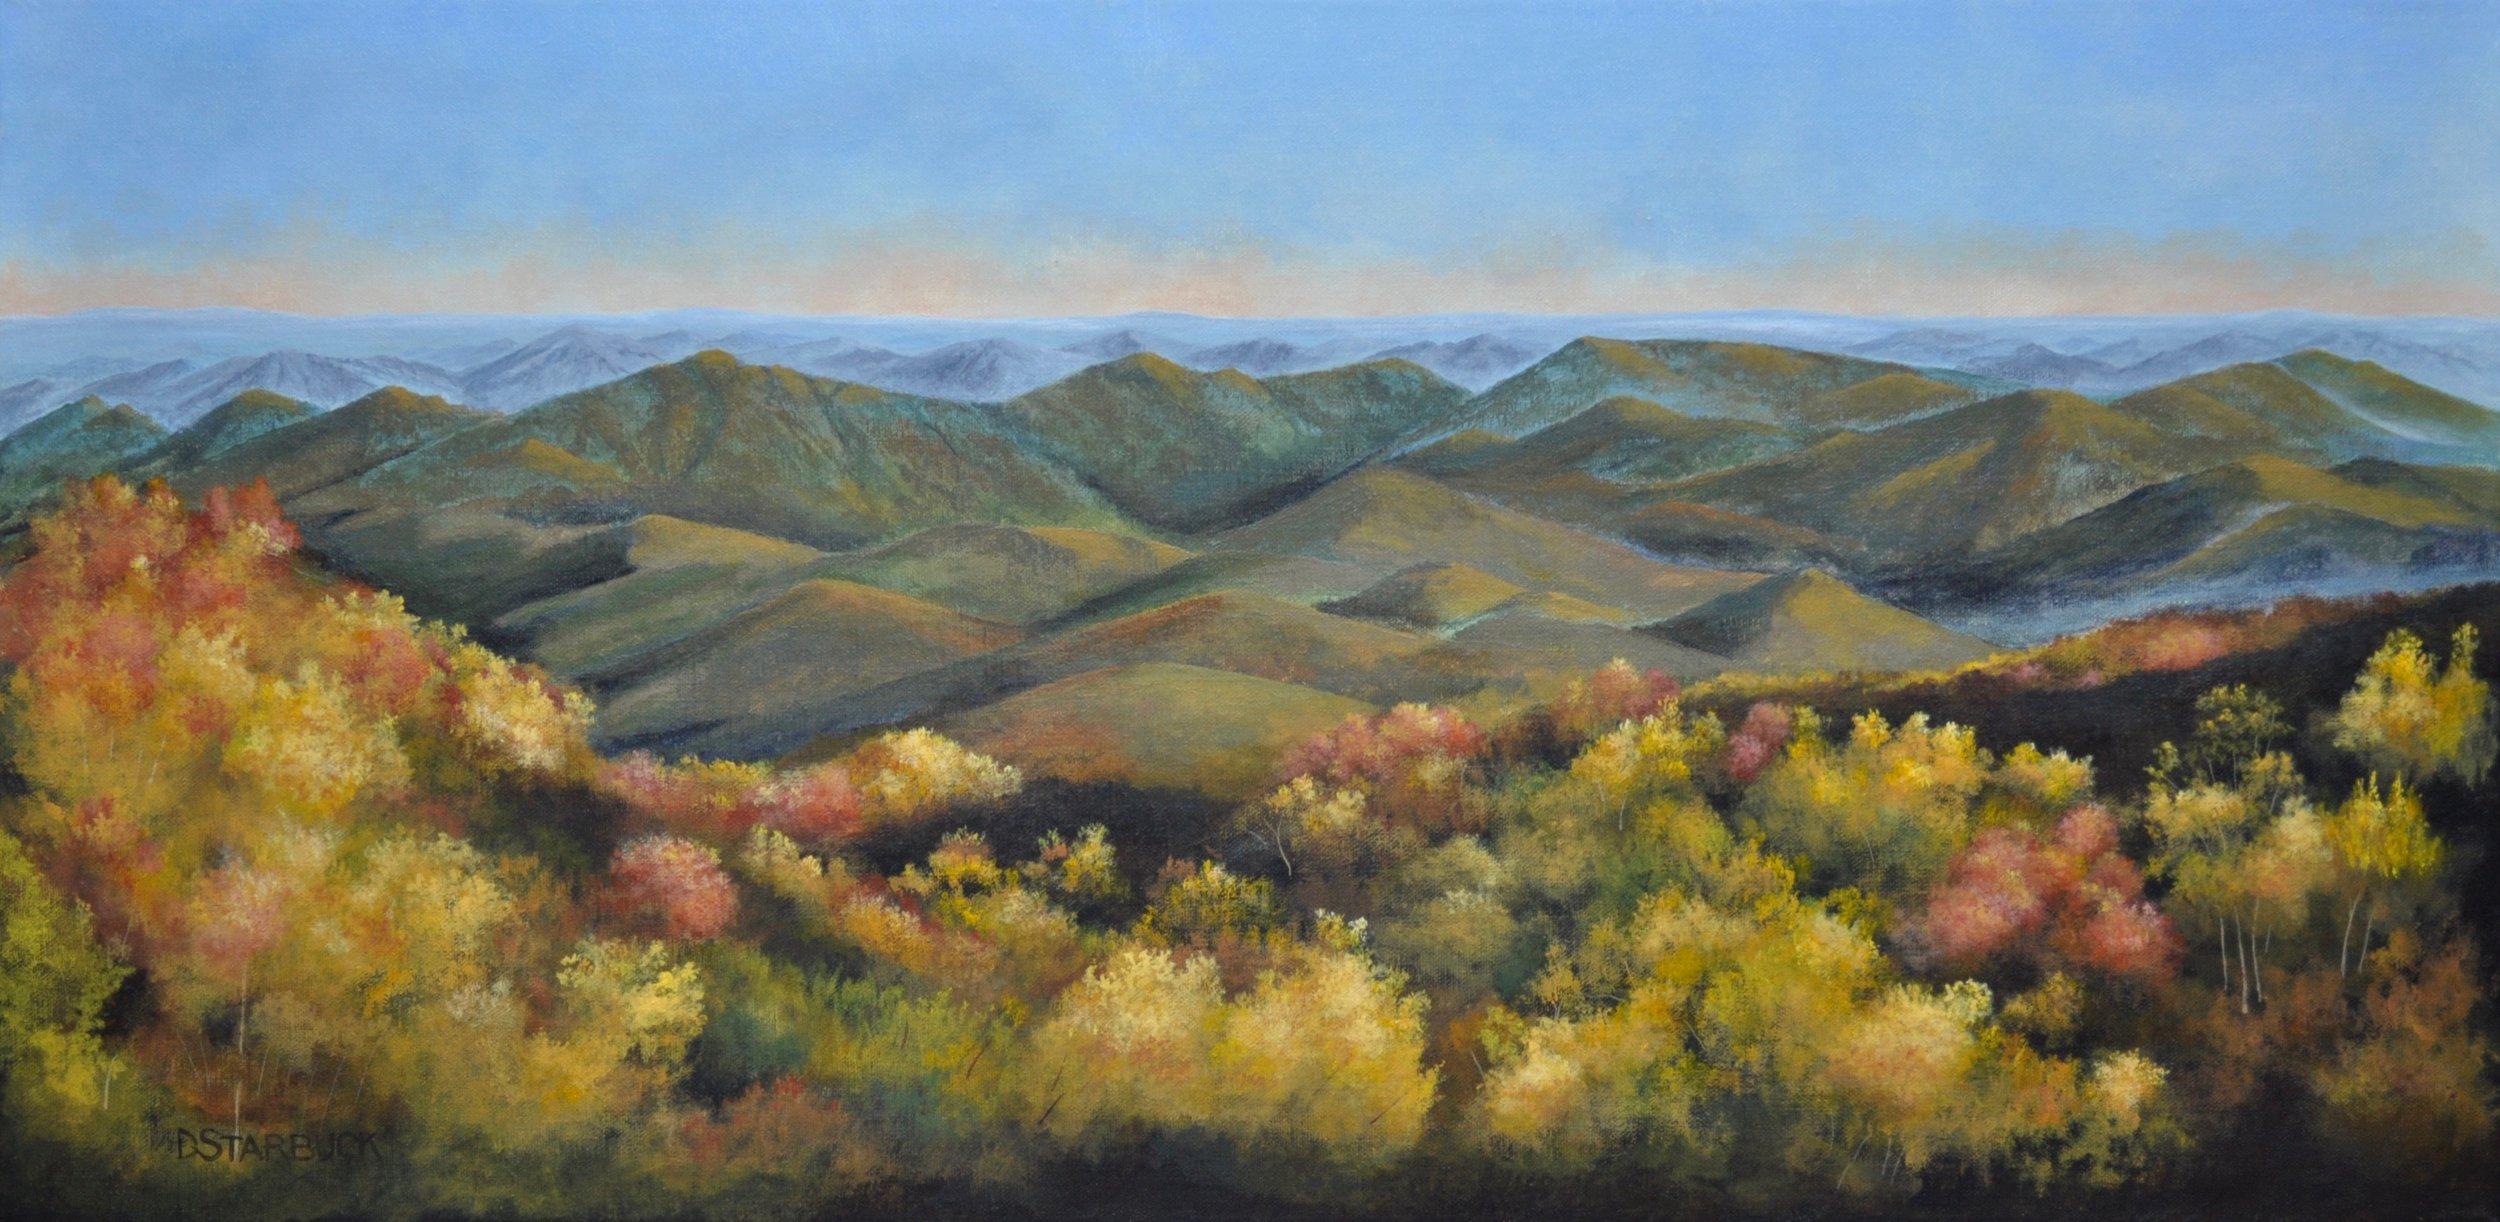 """Stack Creek Mountain Majesty""  Original: Acrylic on Linen, 24"" x 12"""